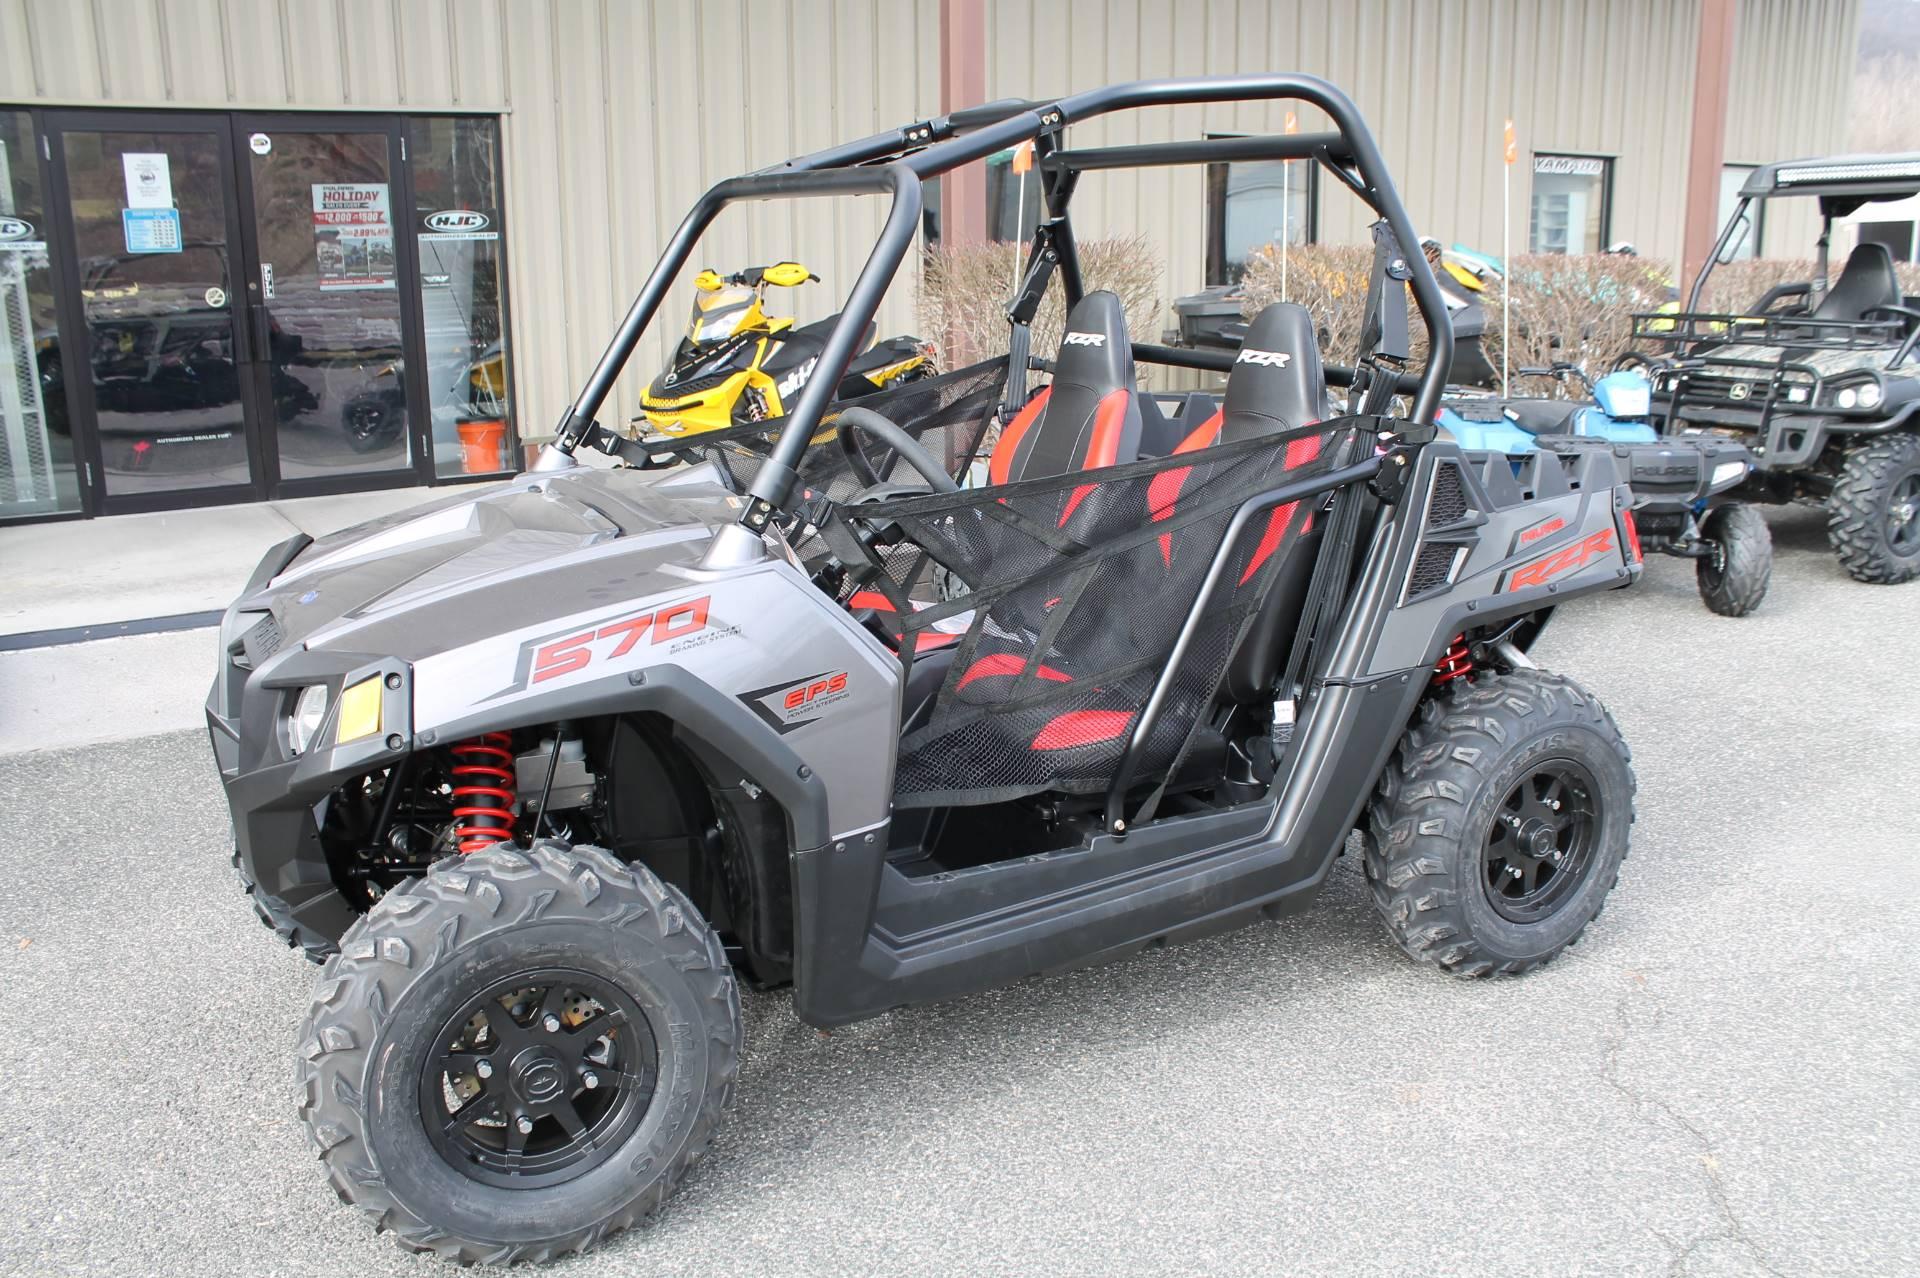 New 2019 Polaris RZR 570 EPS Utility Vehicles in Adams, MA | Stock